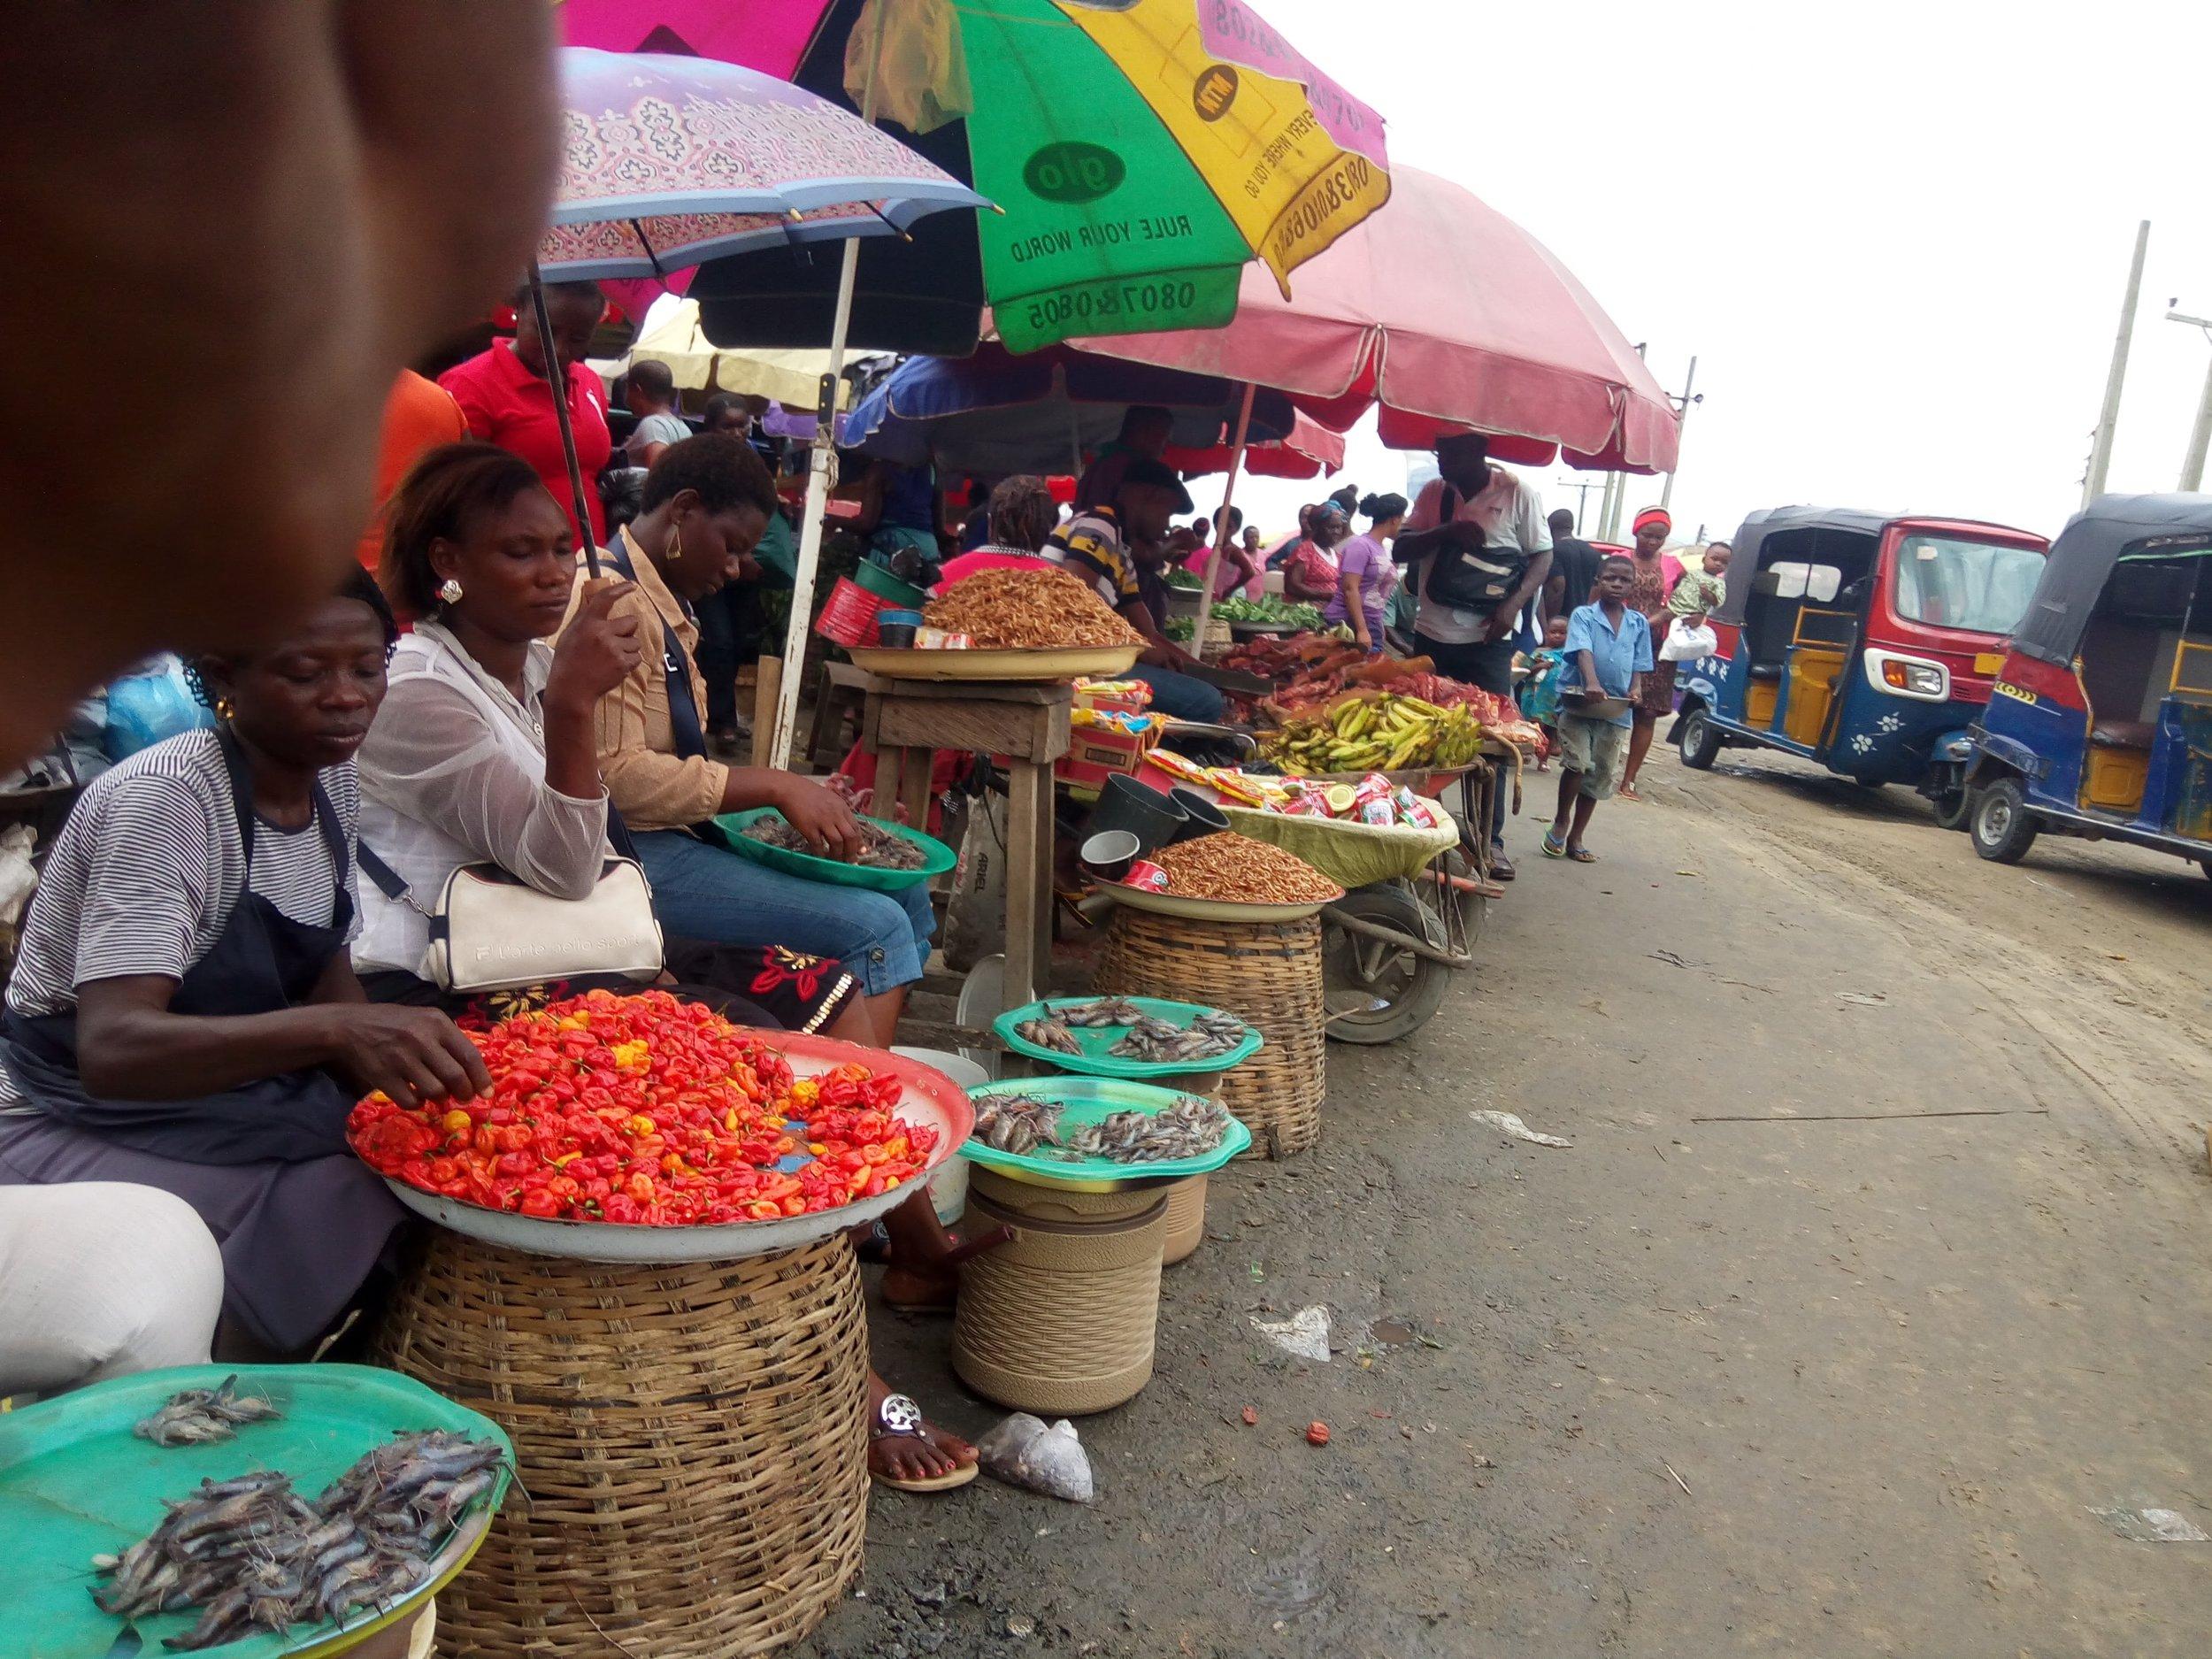 A market in Bayelsa. Photo Credit: Eseharrison , Swali Market, Swali. Bayelsa, Nigeria , CC BY-SA 4.0